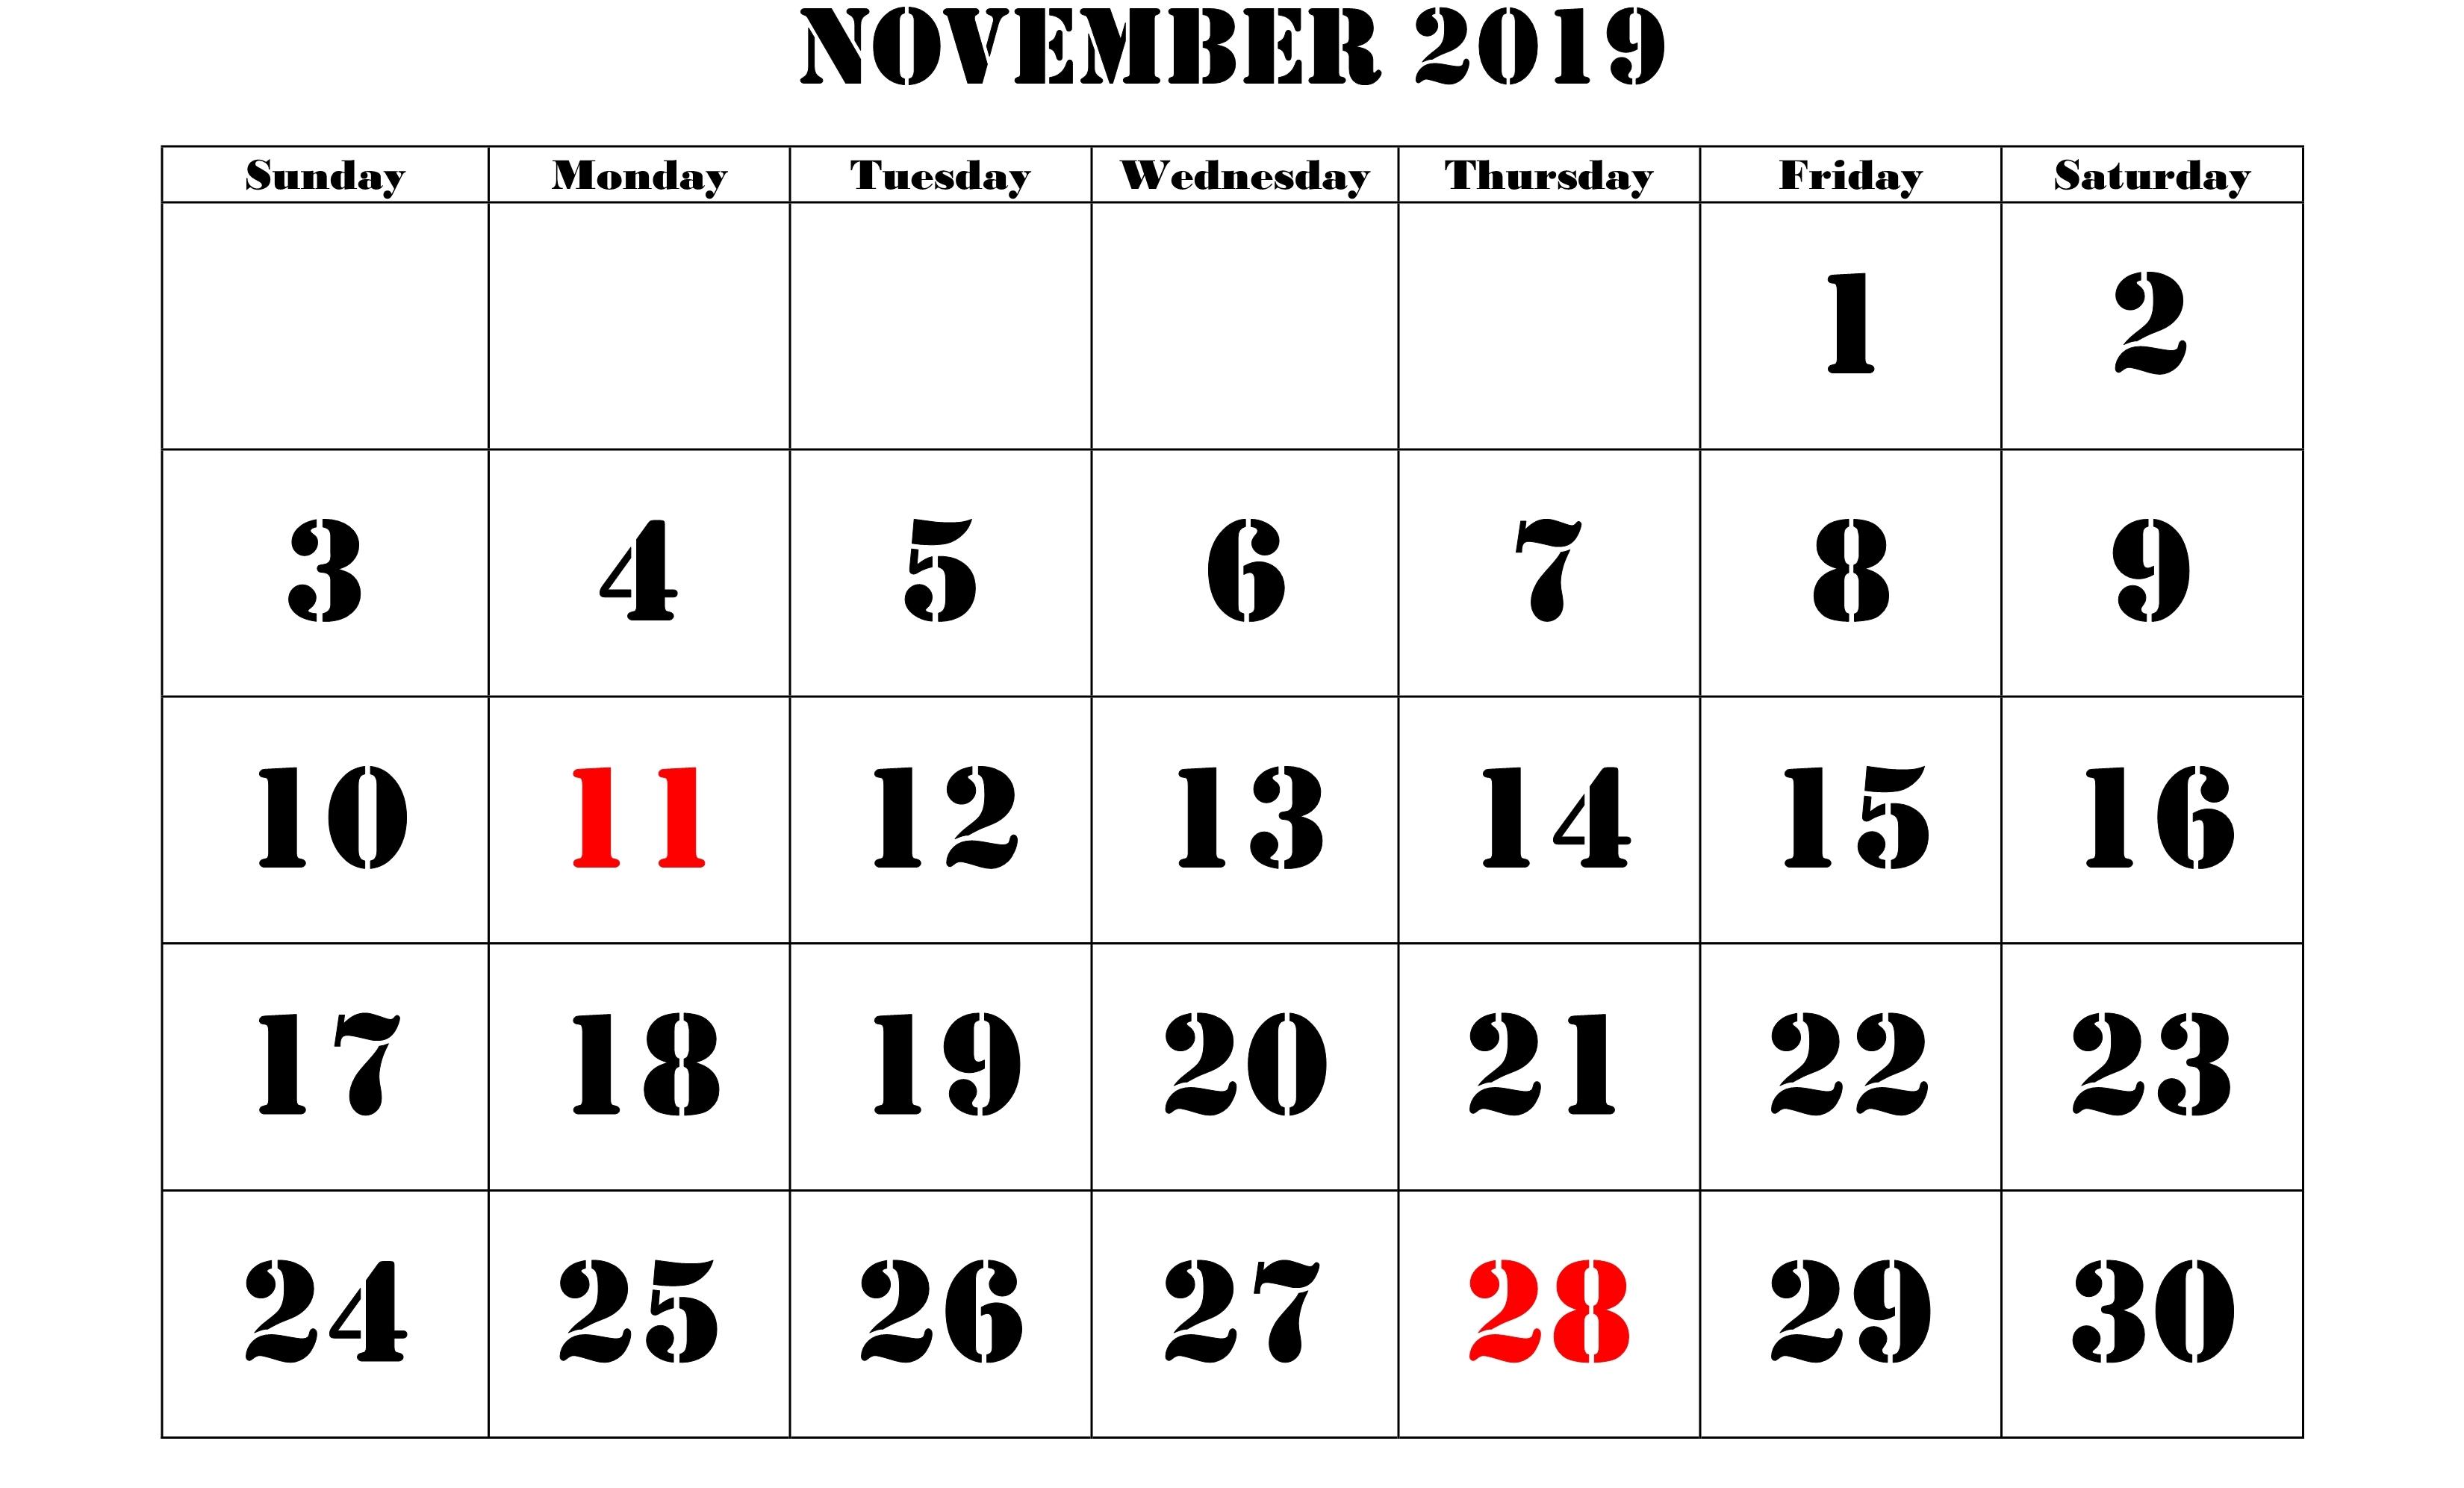 November 2019 Calendar Holidays